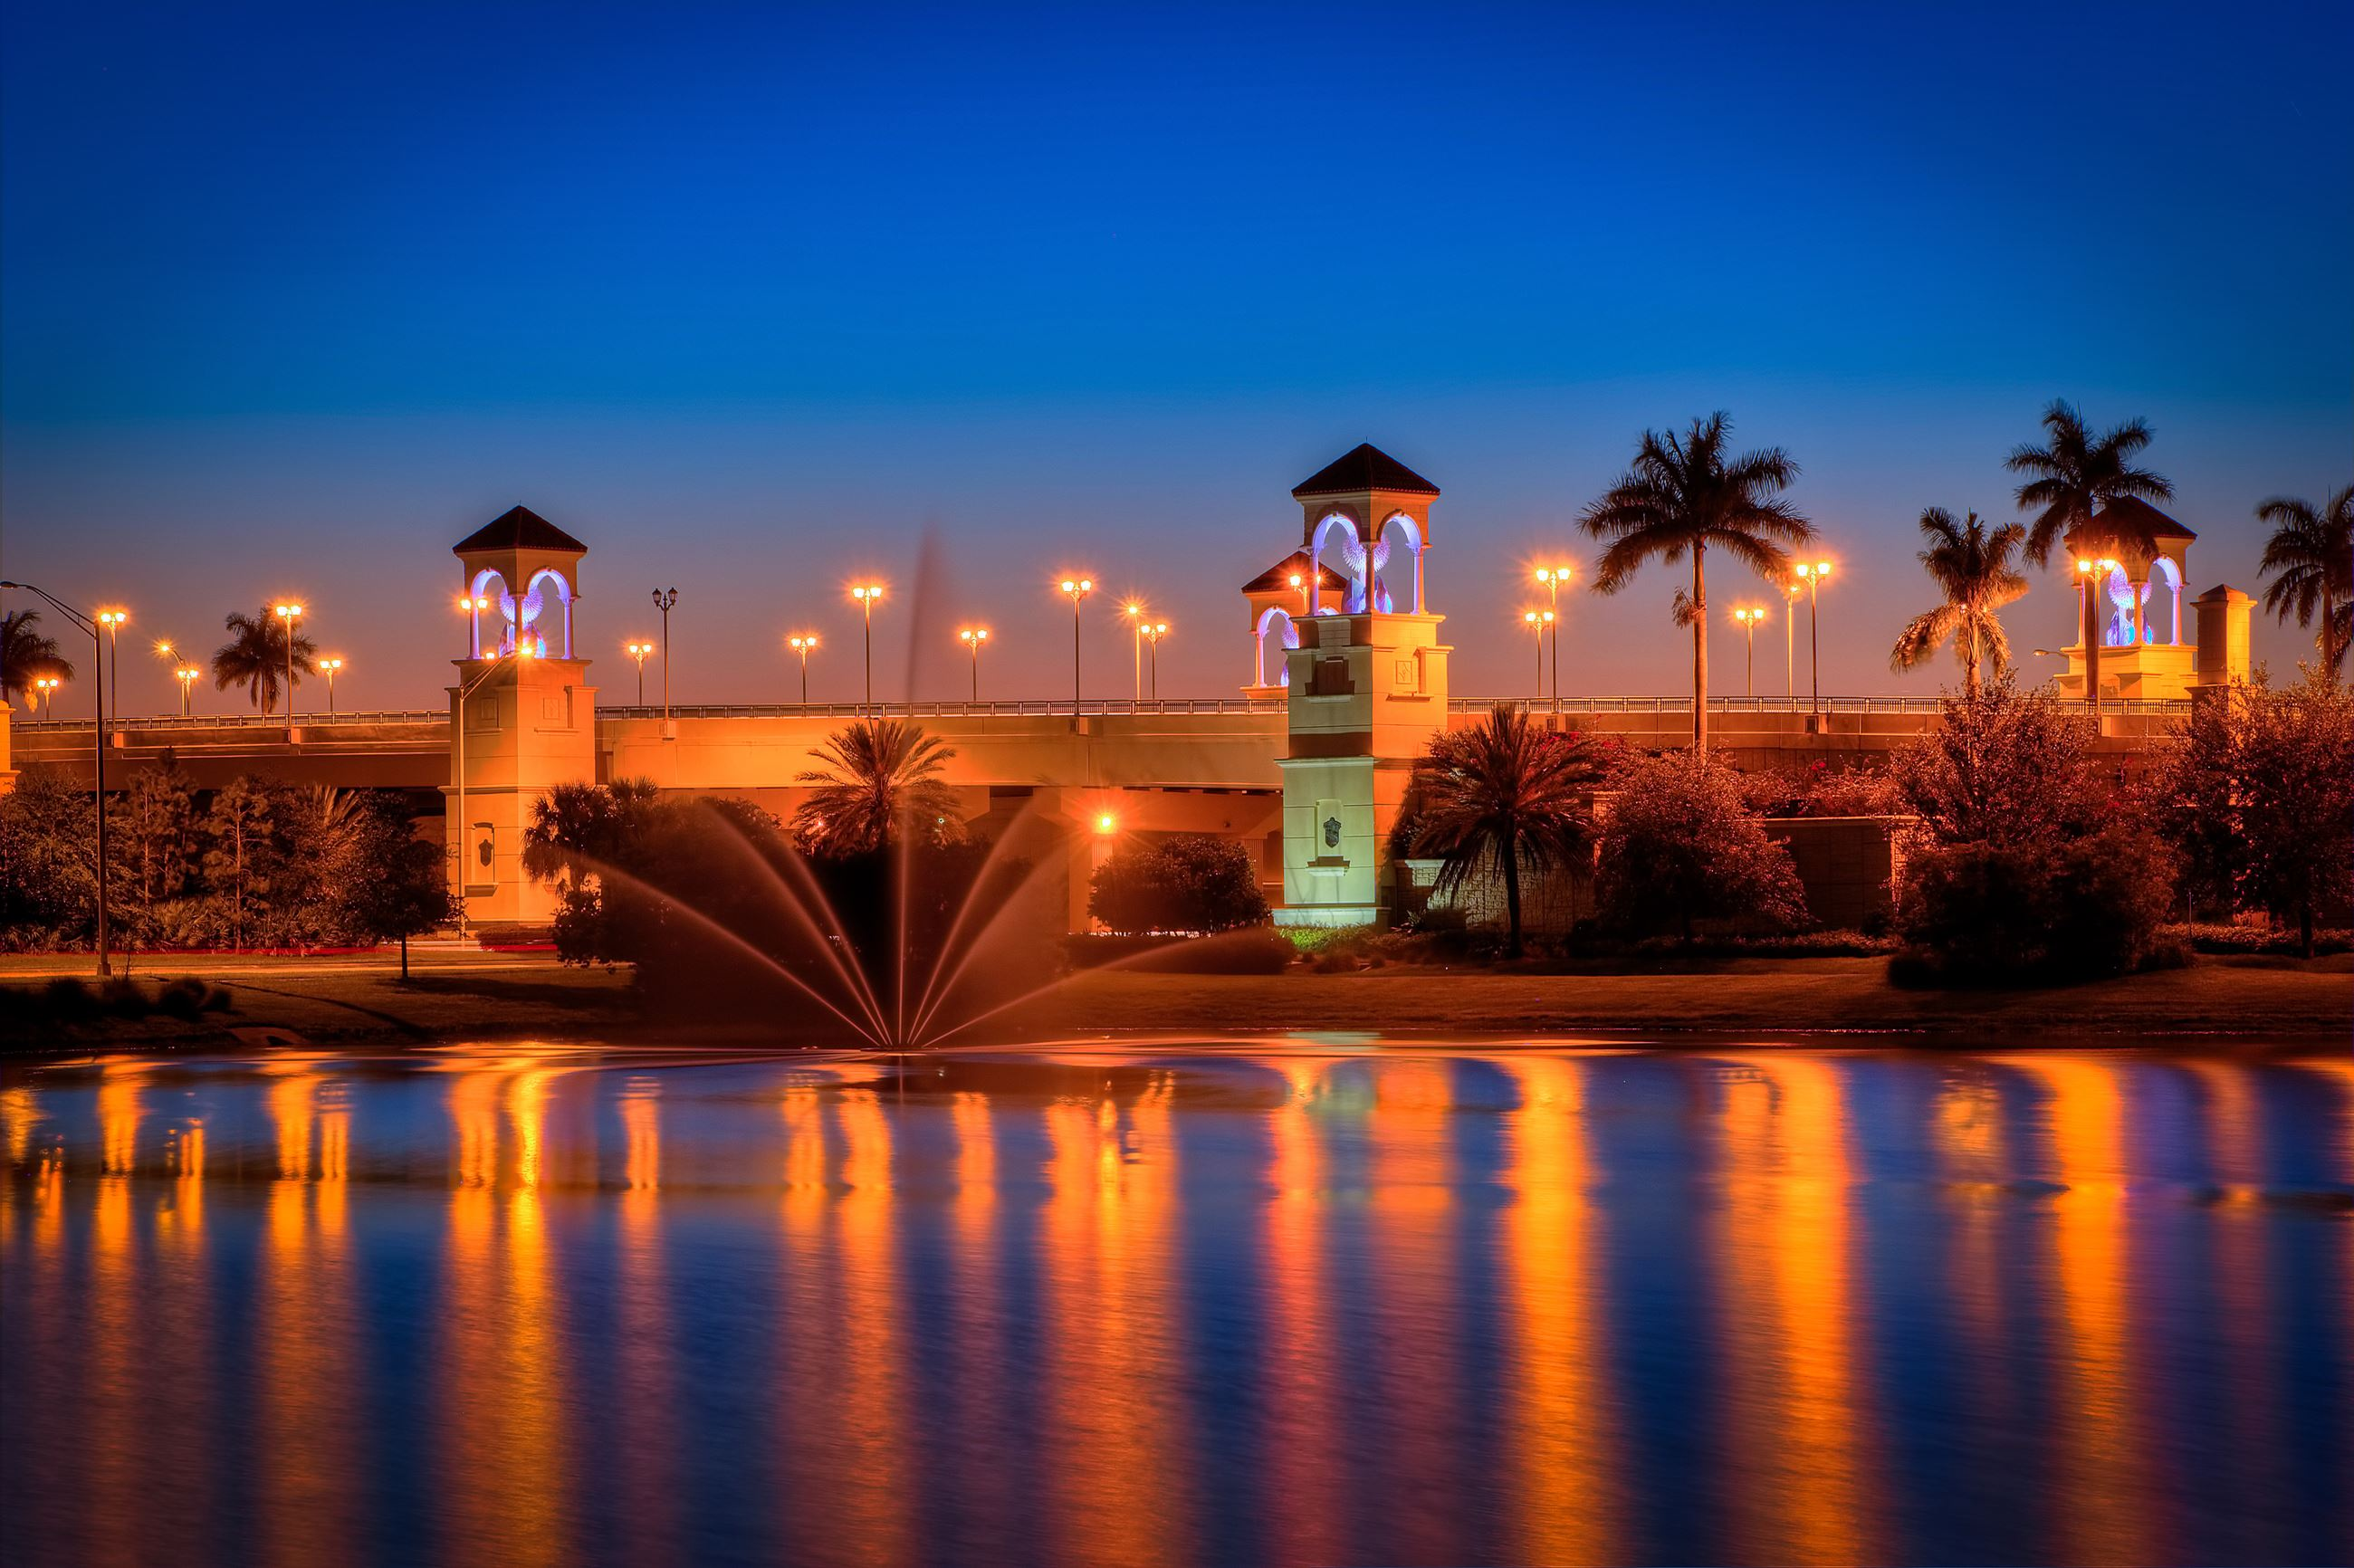 Bridge lighting schedule palm beach gardens fl - Things to do in palm beach gardens ...